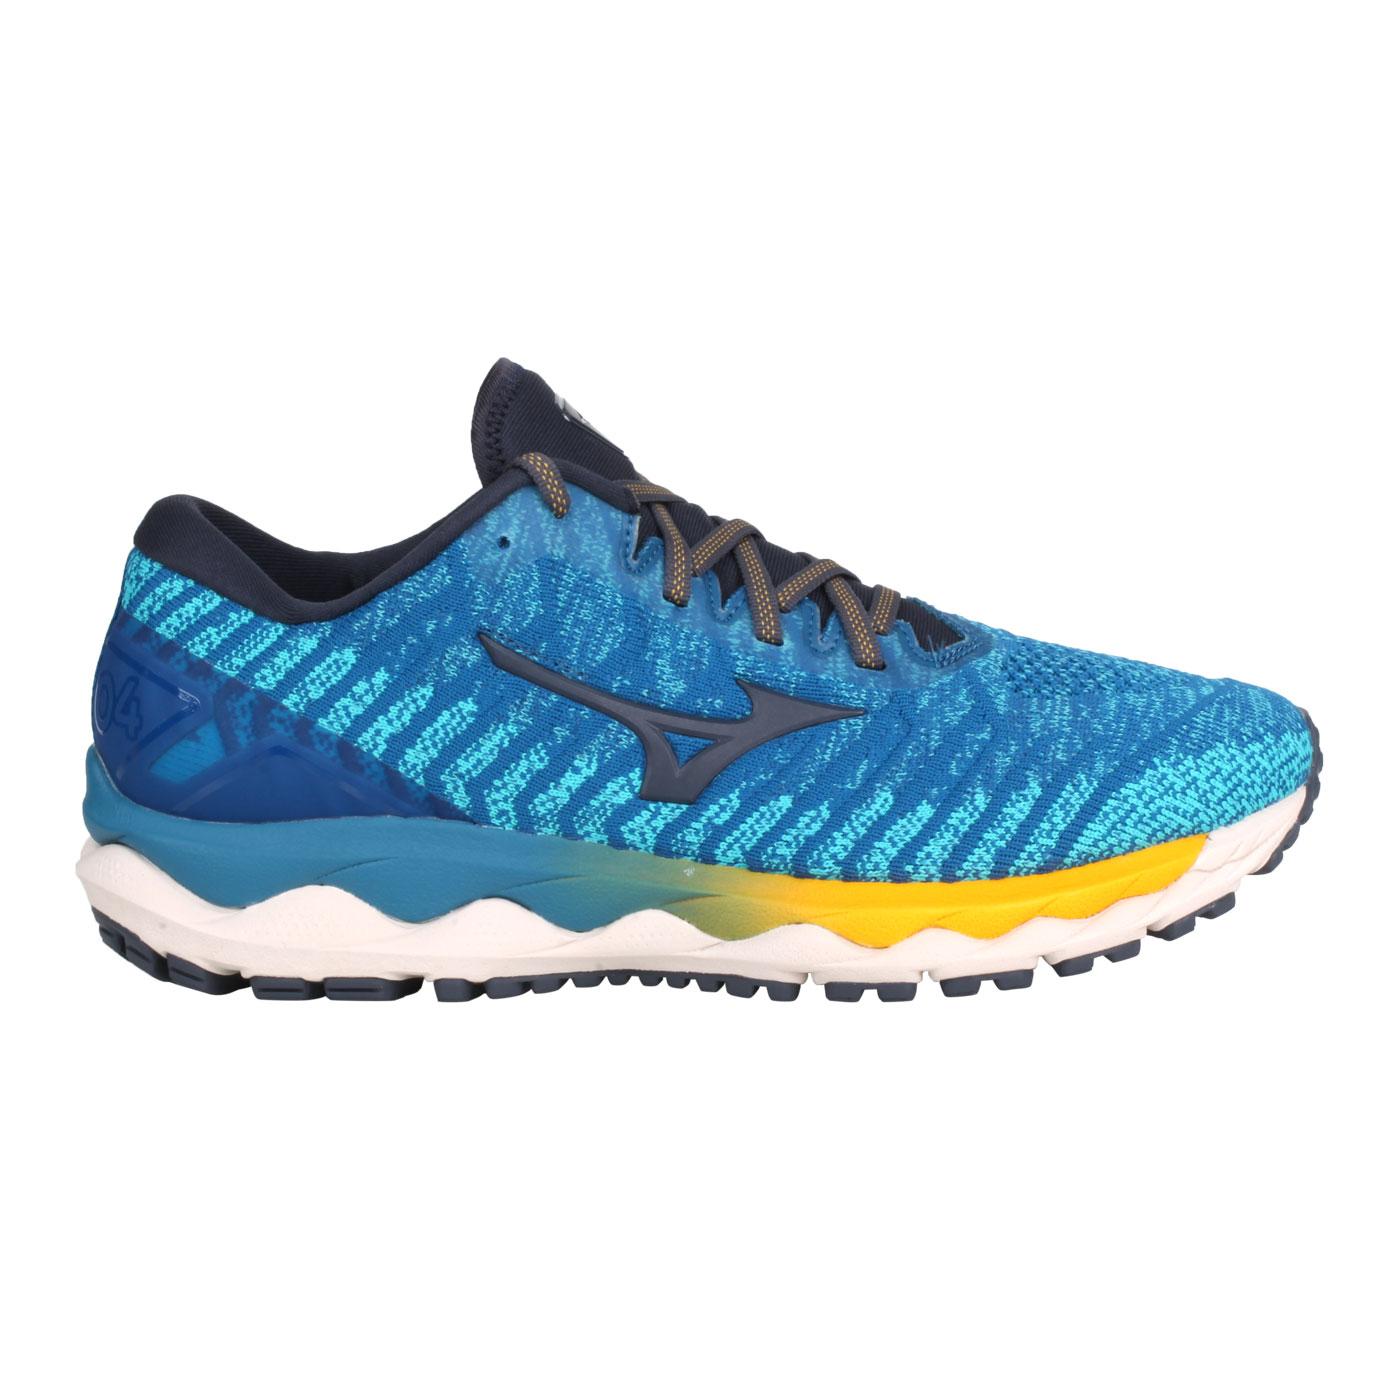 MIZUNO 男款慢跑鞋-4E  @WAVE SKY 4 WAVEKNIT SW@J1GC203930 - 藍水藍黃